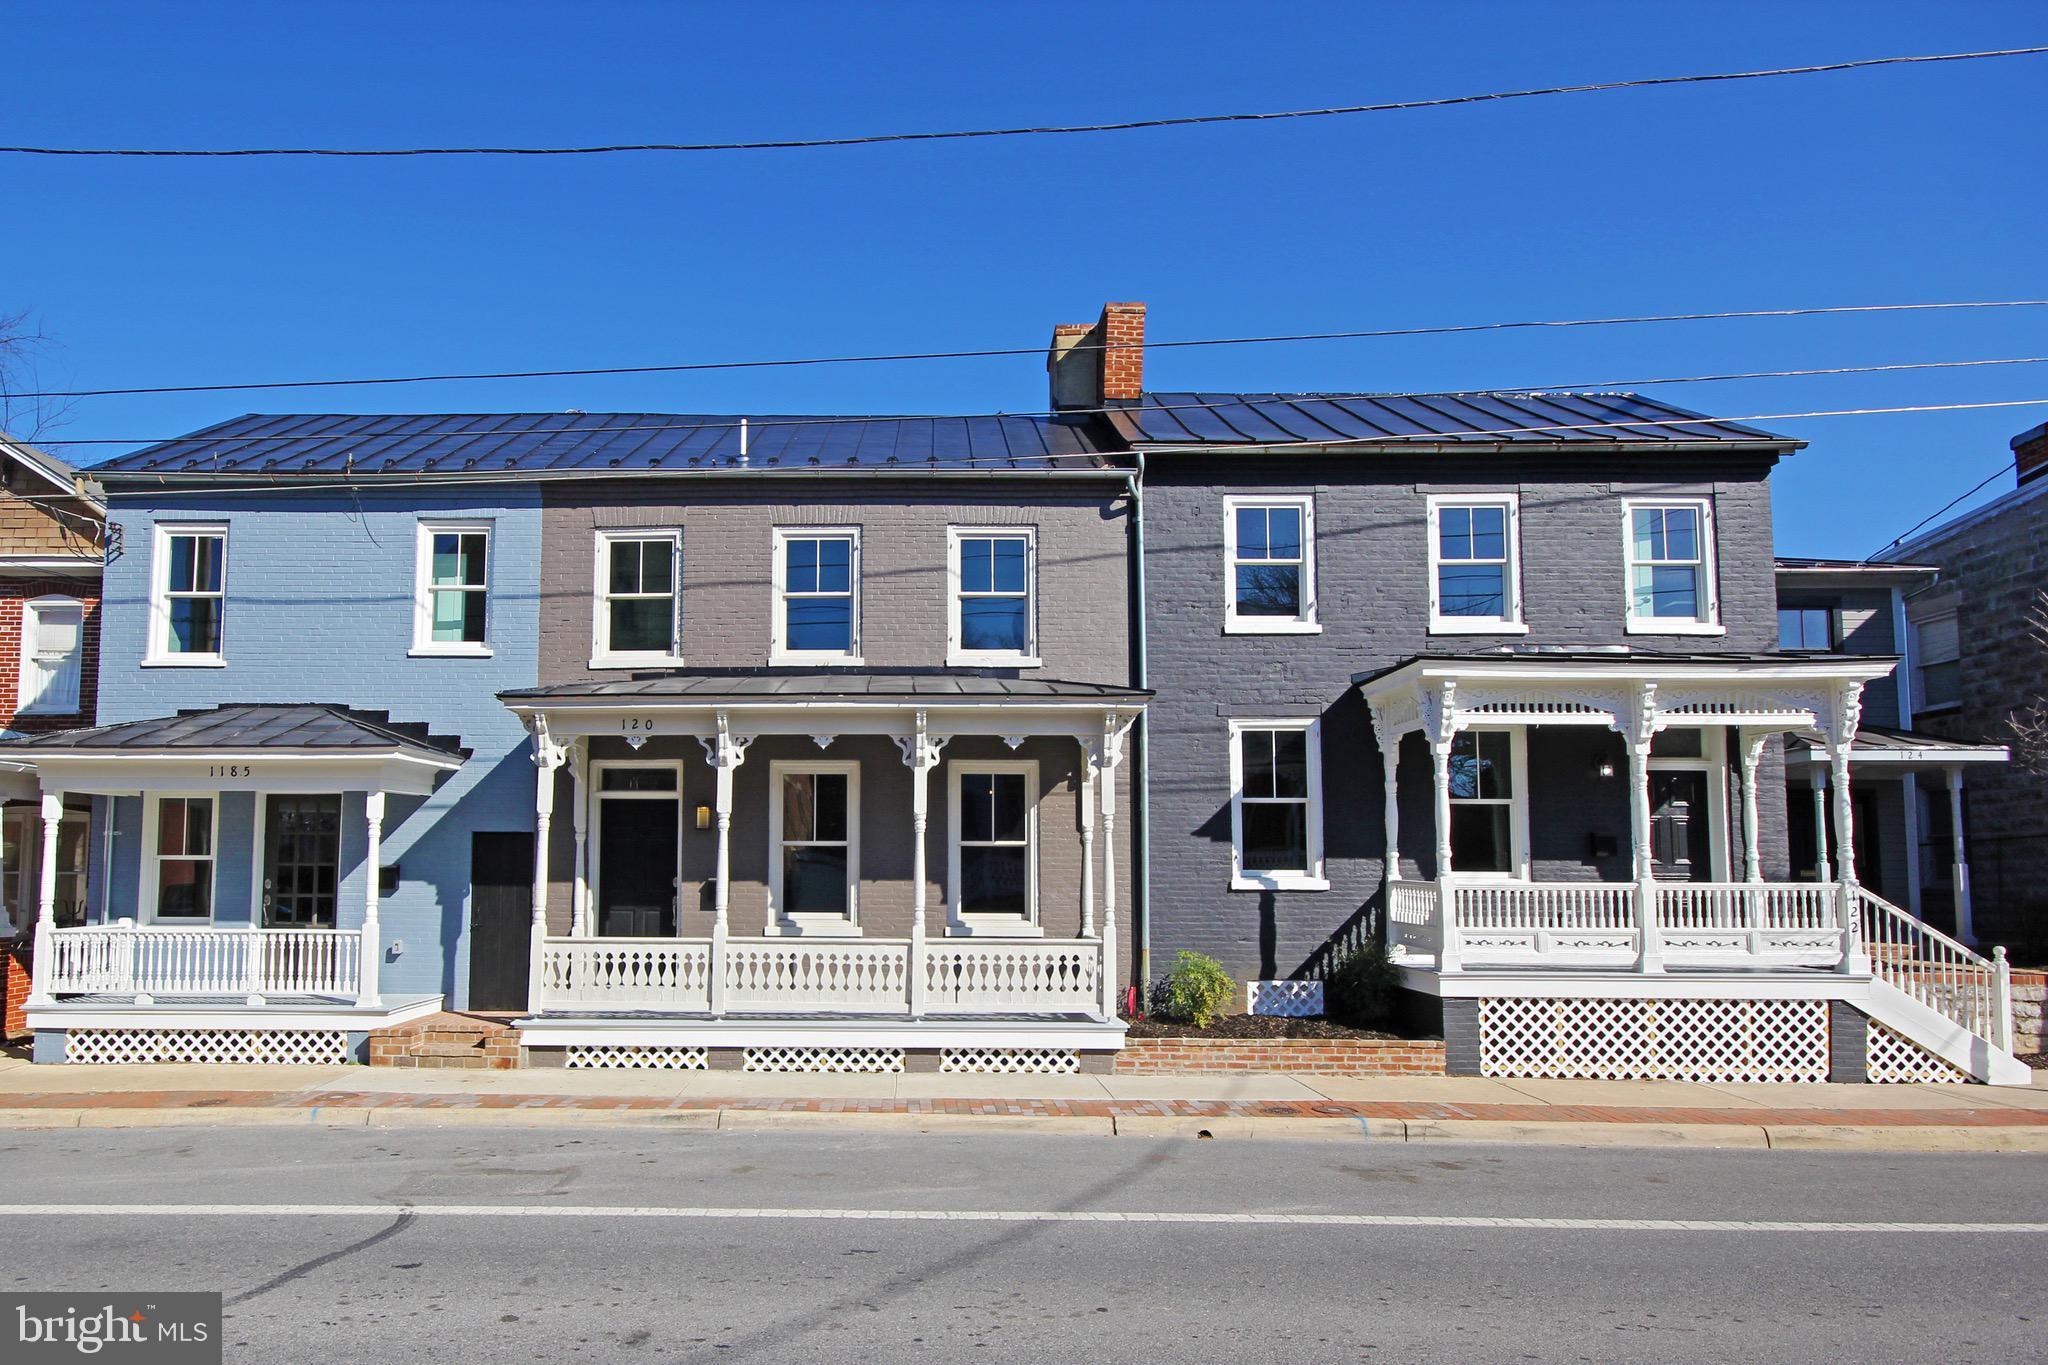 122 E Cork St, Winchester, VA, 22601